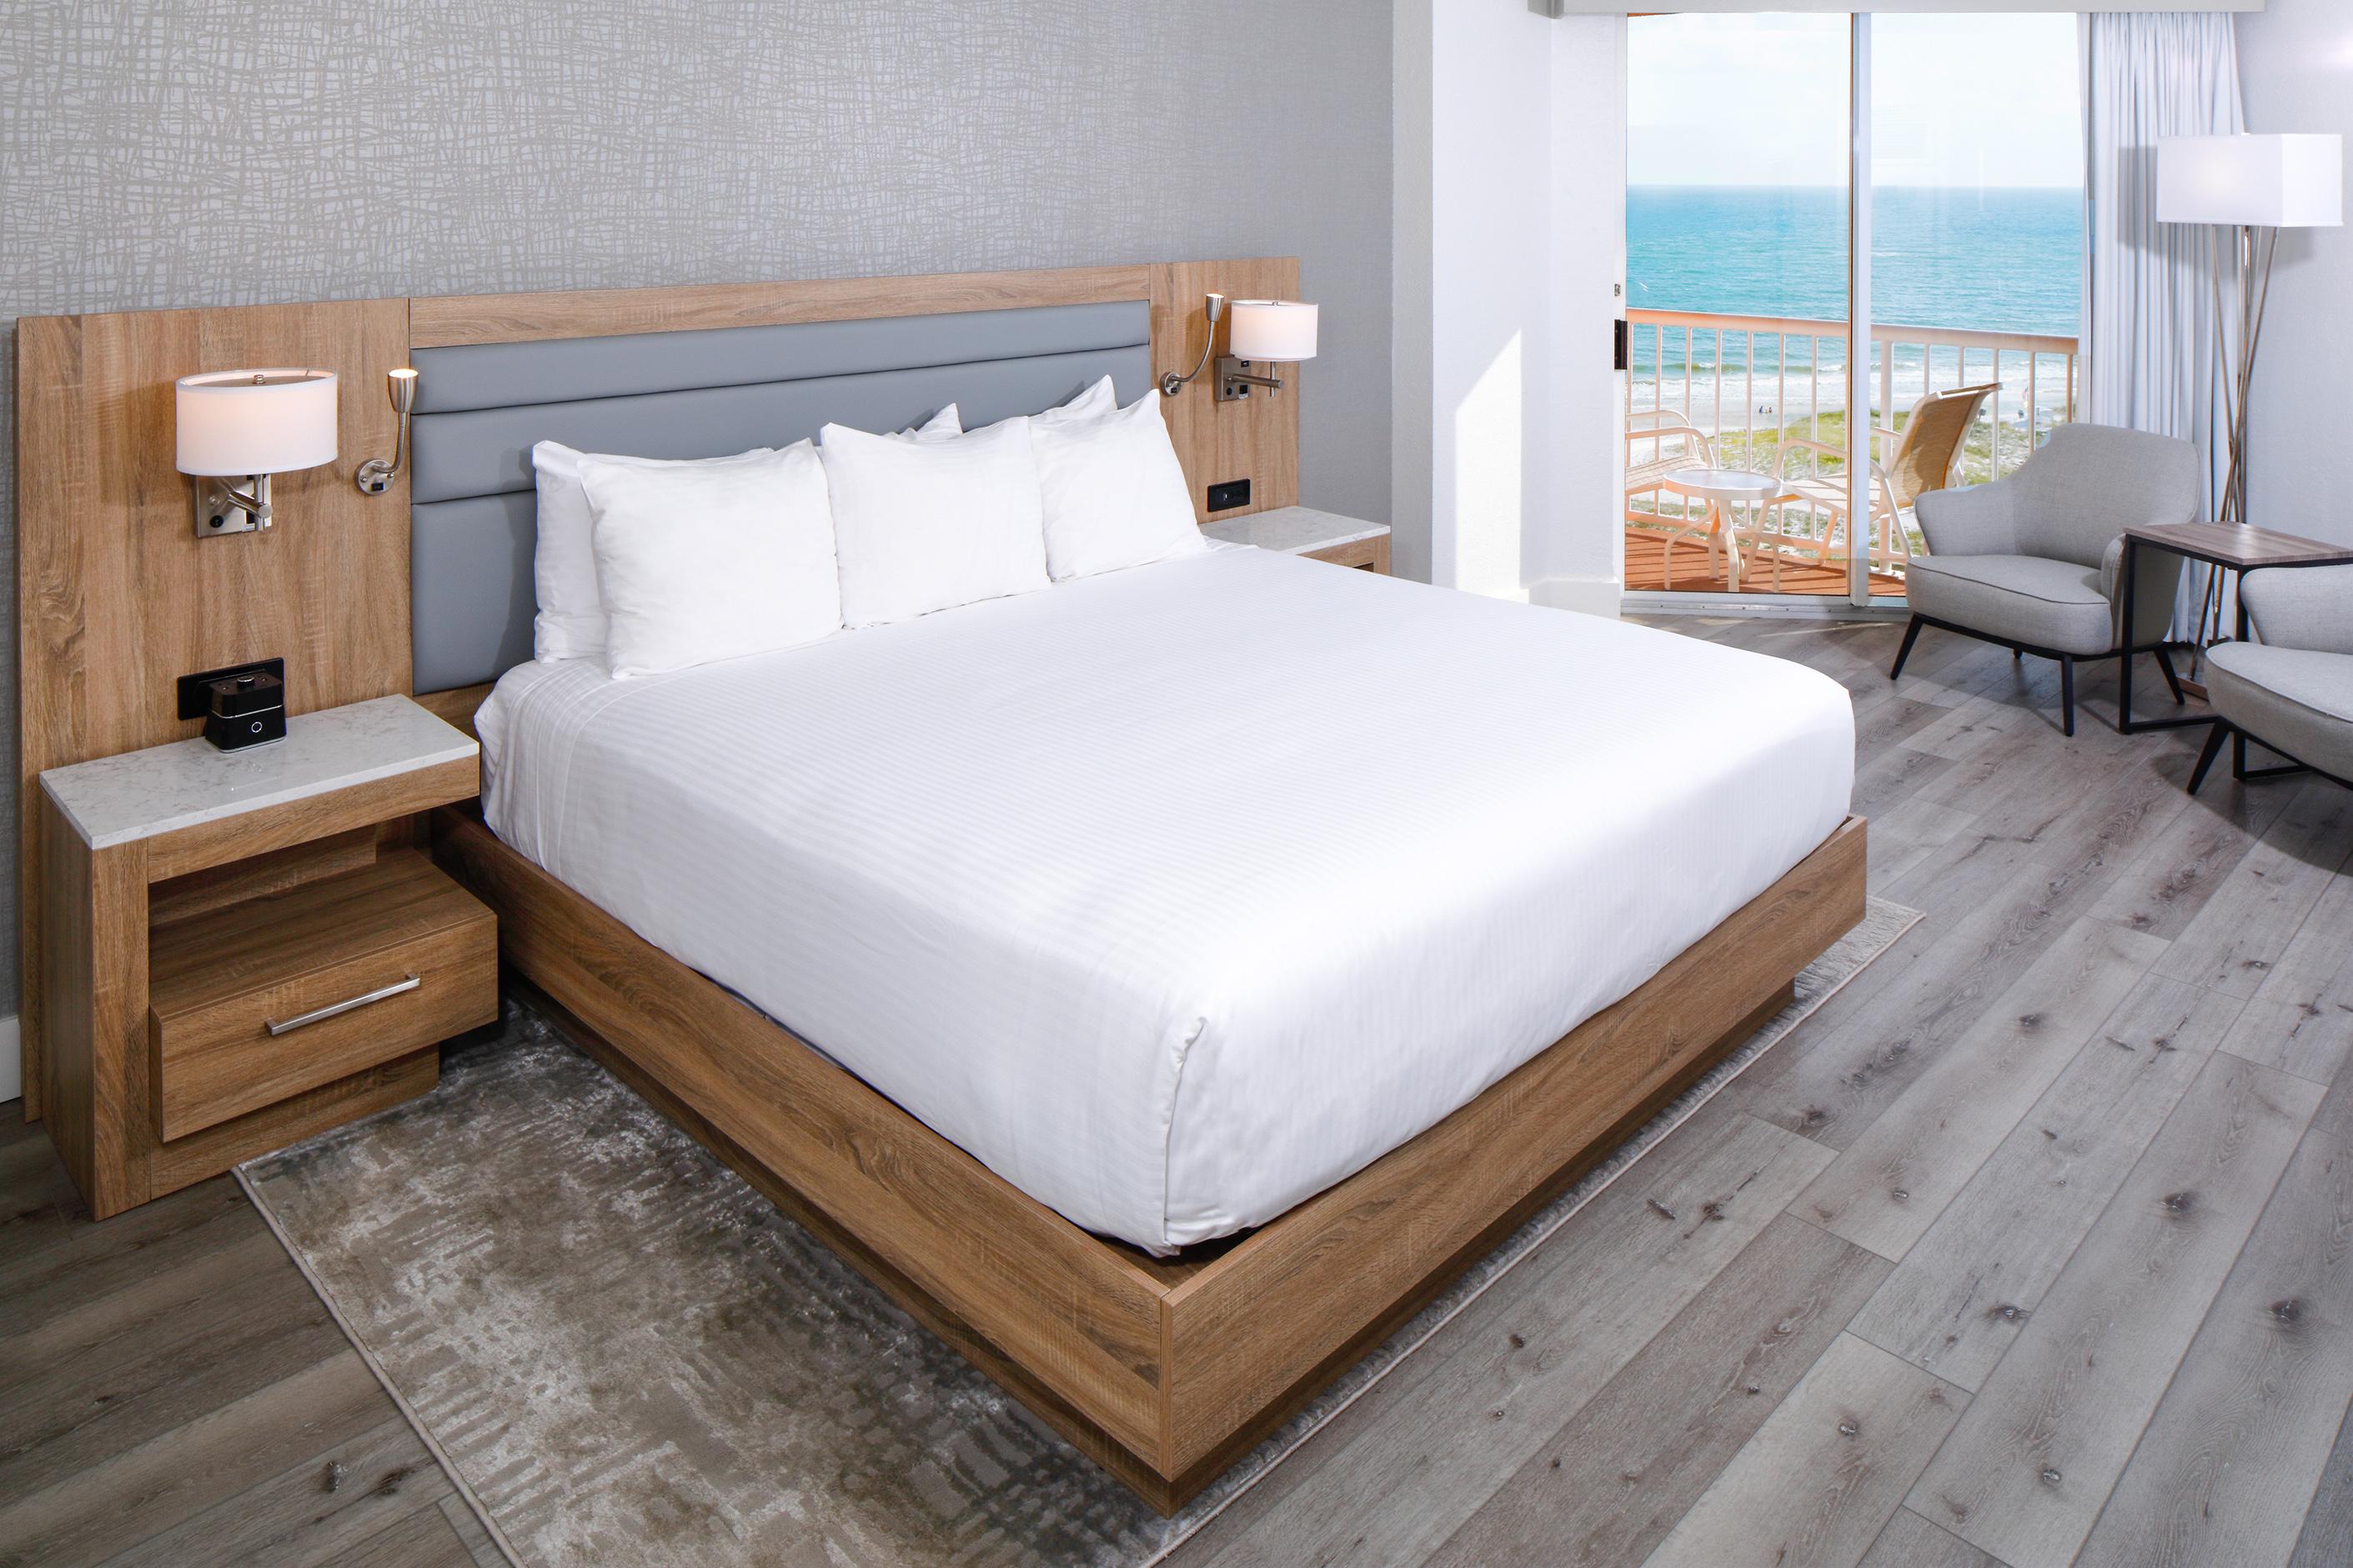 Perdido Beach Beach View Room featuring one king bed